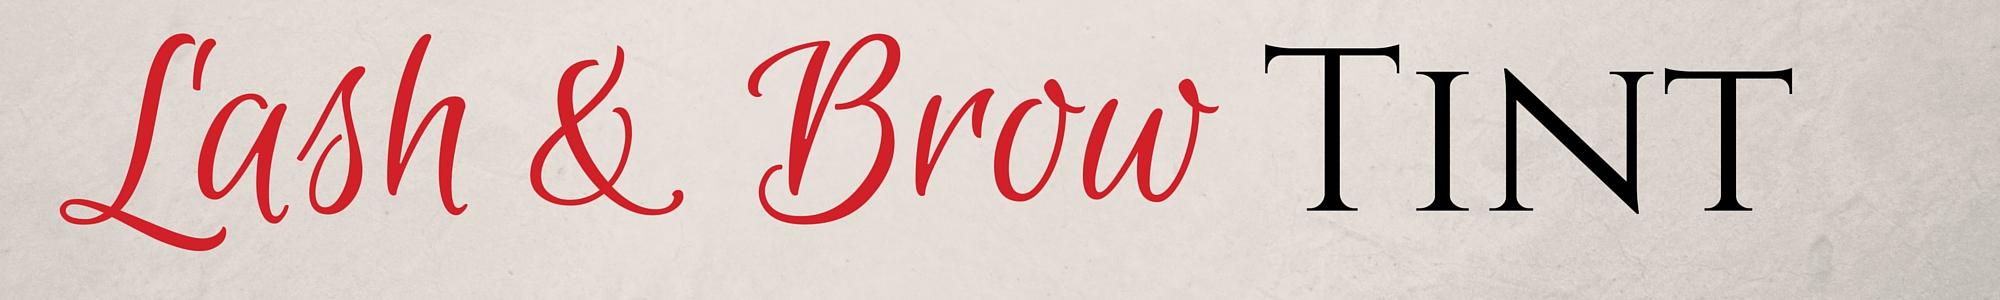 LASH and BROW Tint | Virtu Skin & Body